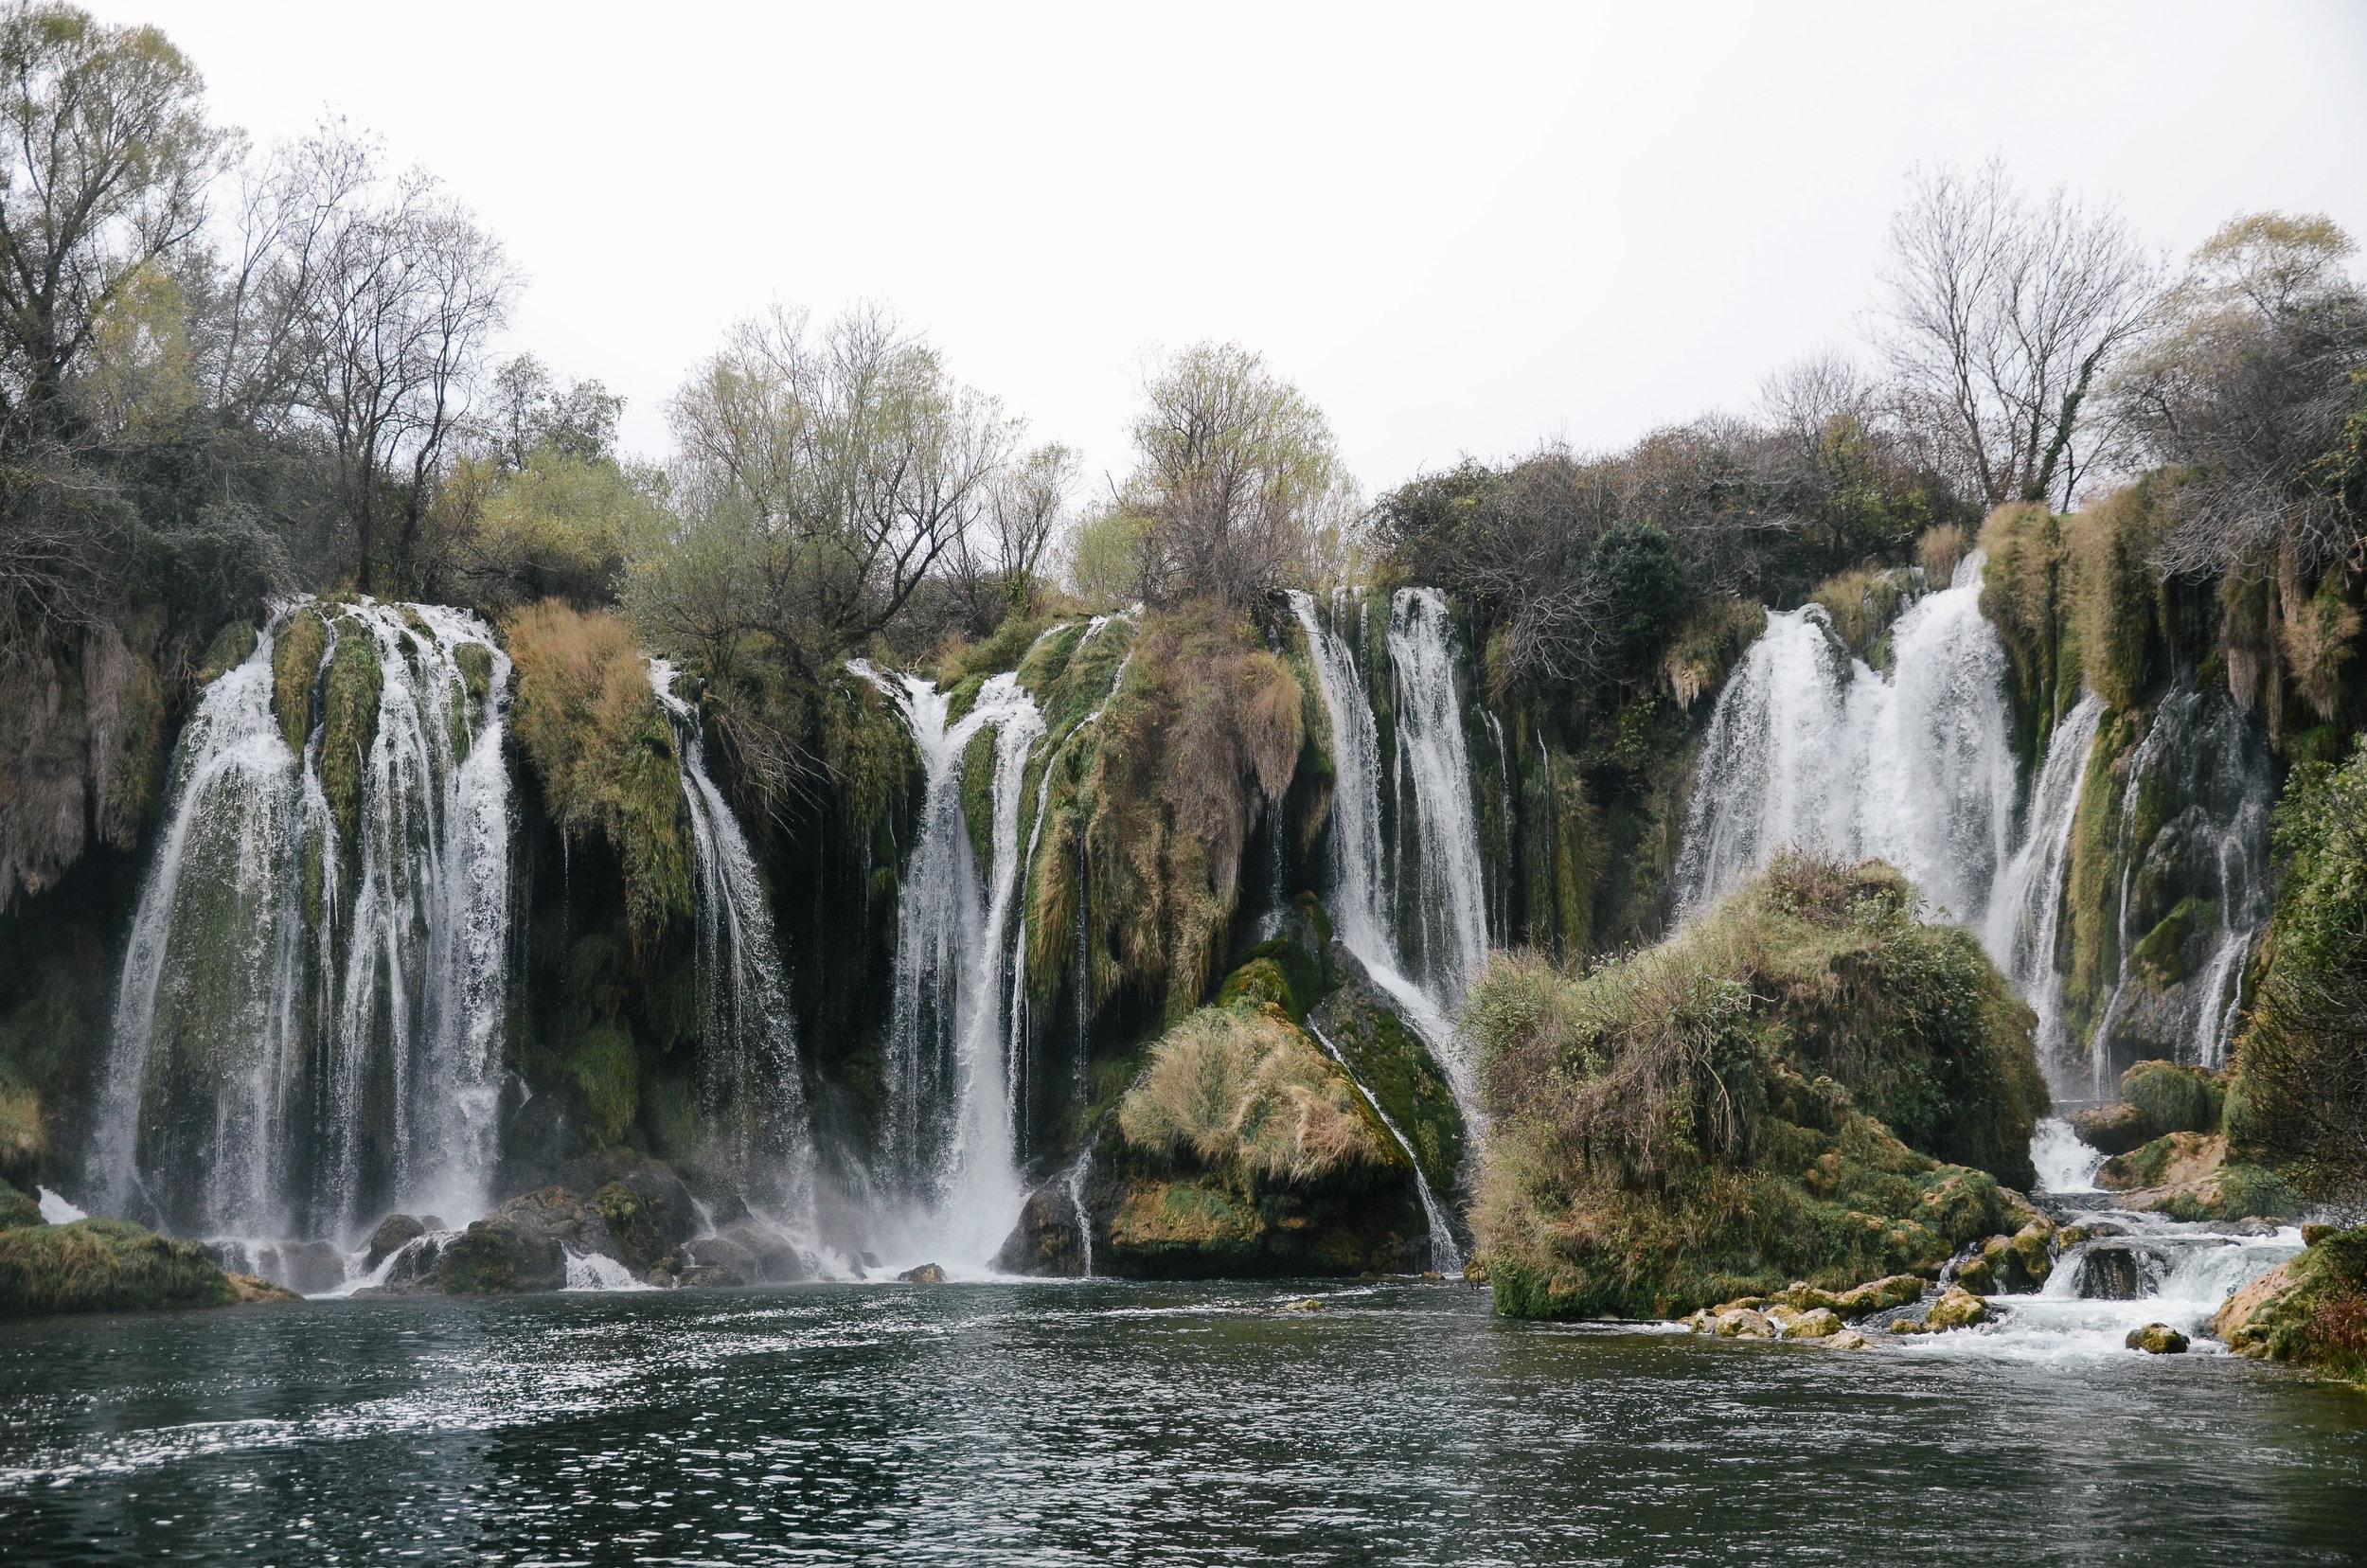 mostar-bosnia-travel-guide-lifeonpine_DSC_3271.jpg